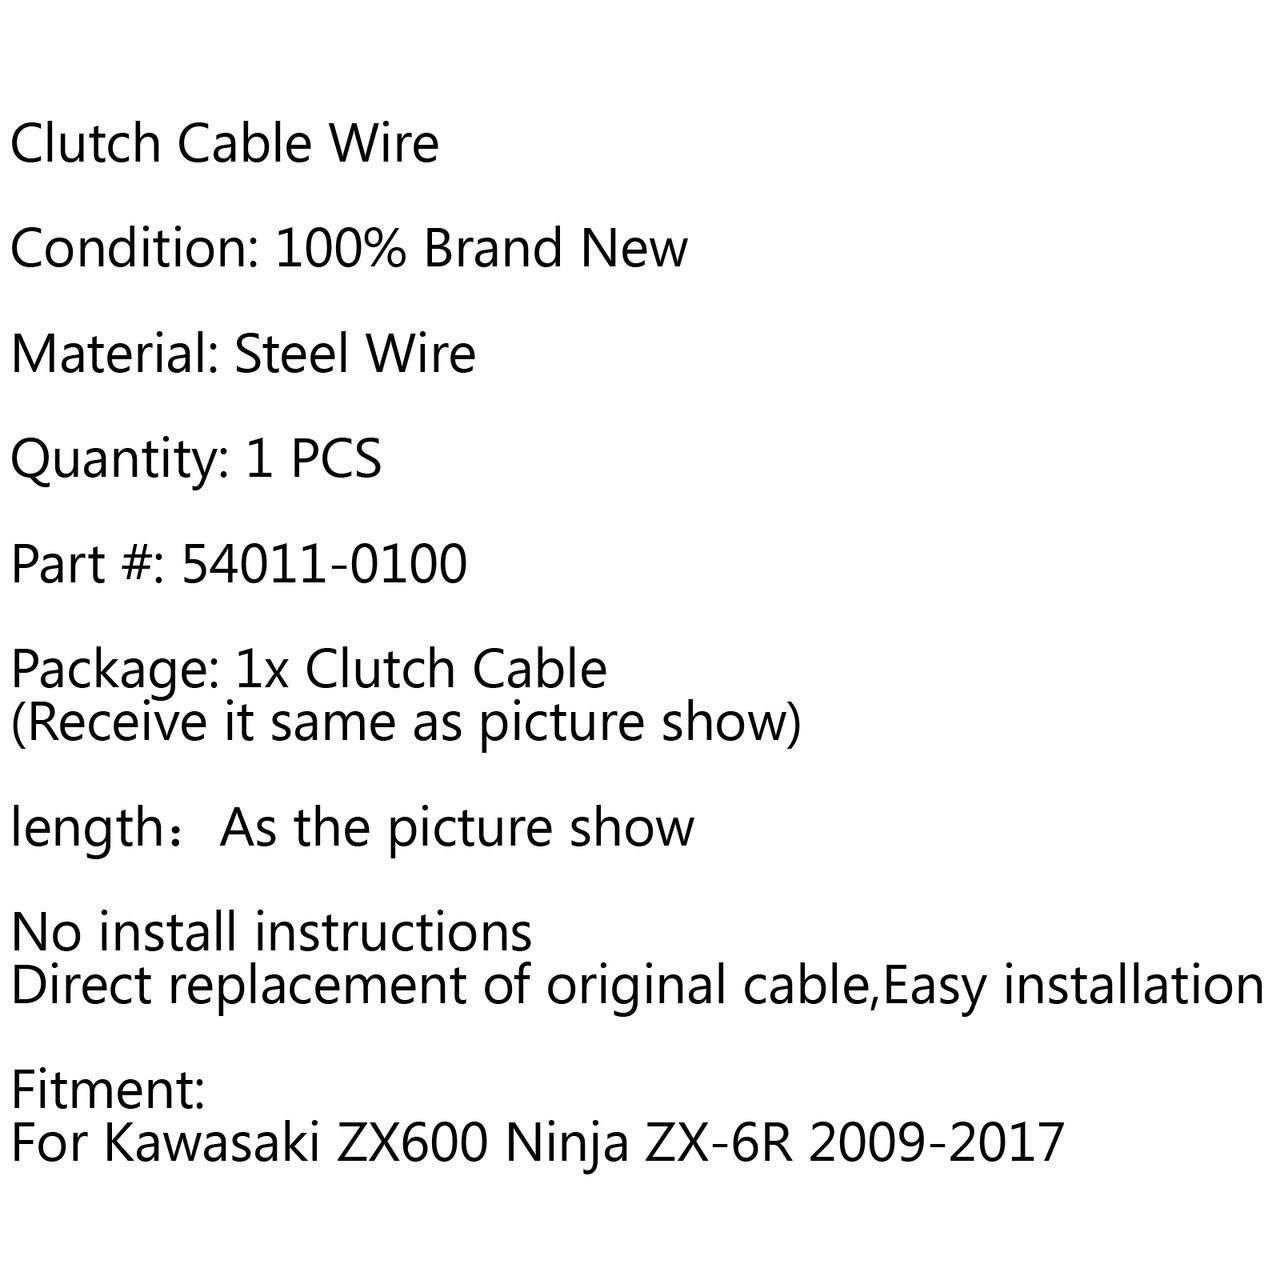 Clutch Cable Replacement Kawasaki ZX600 Ninja ZX-6R (2009-2017)